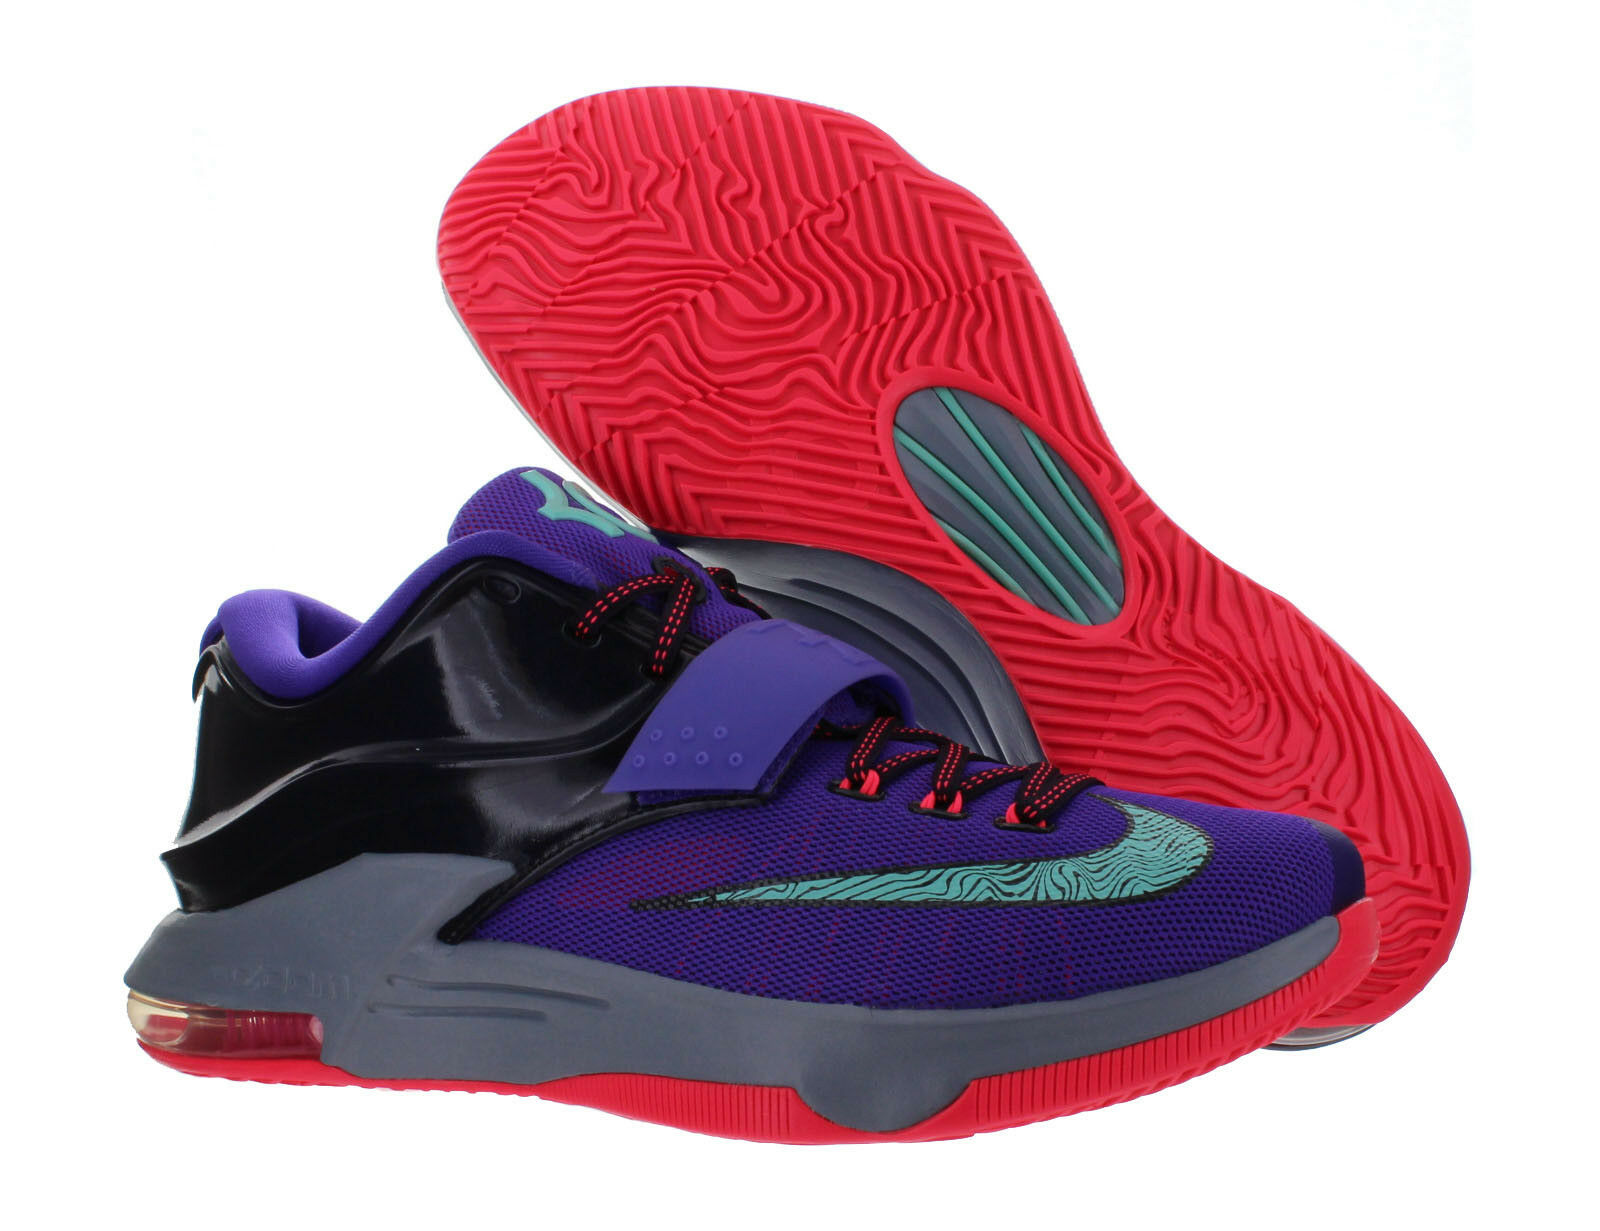 New Mens Nike KD 7 VII